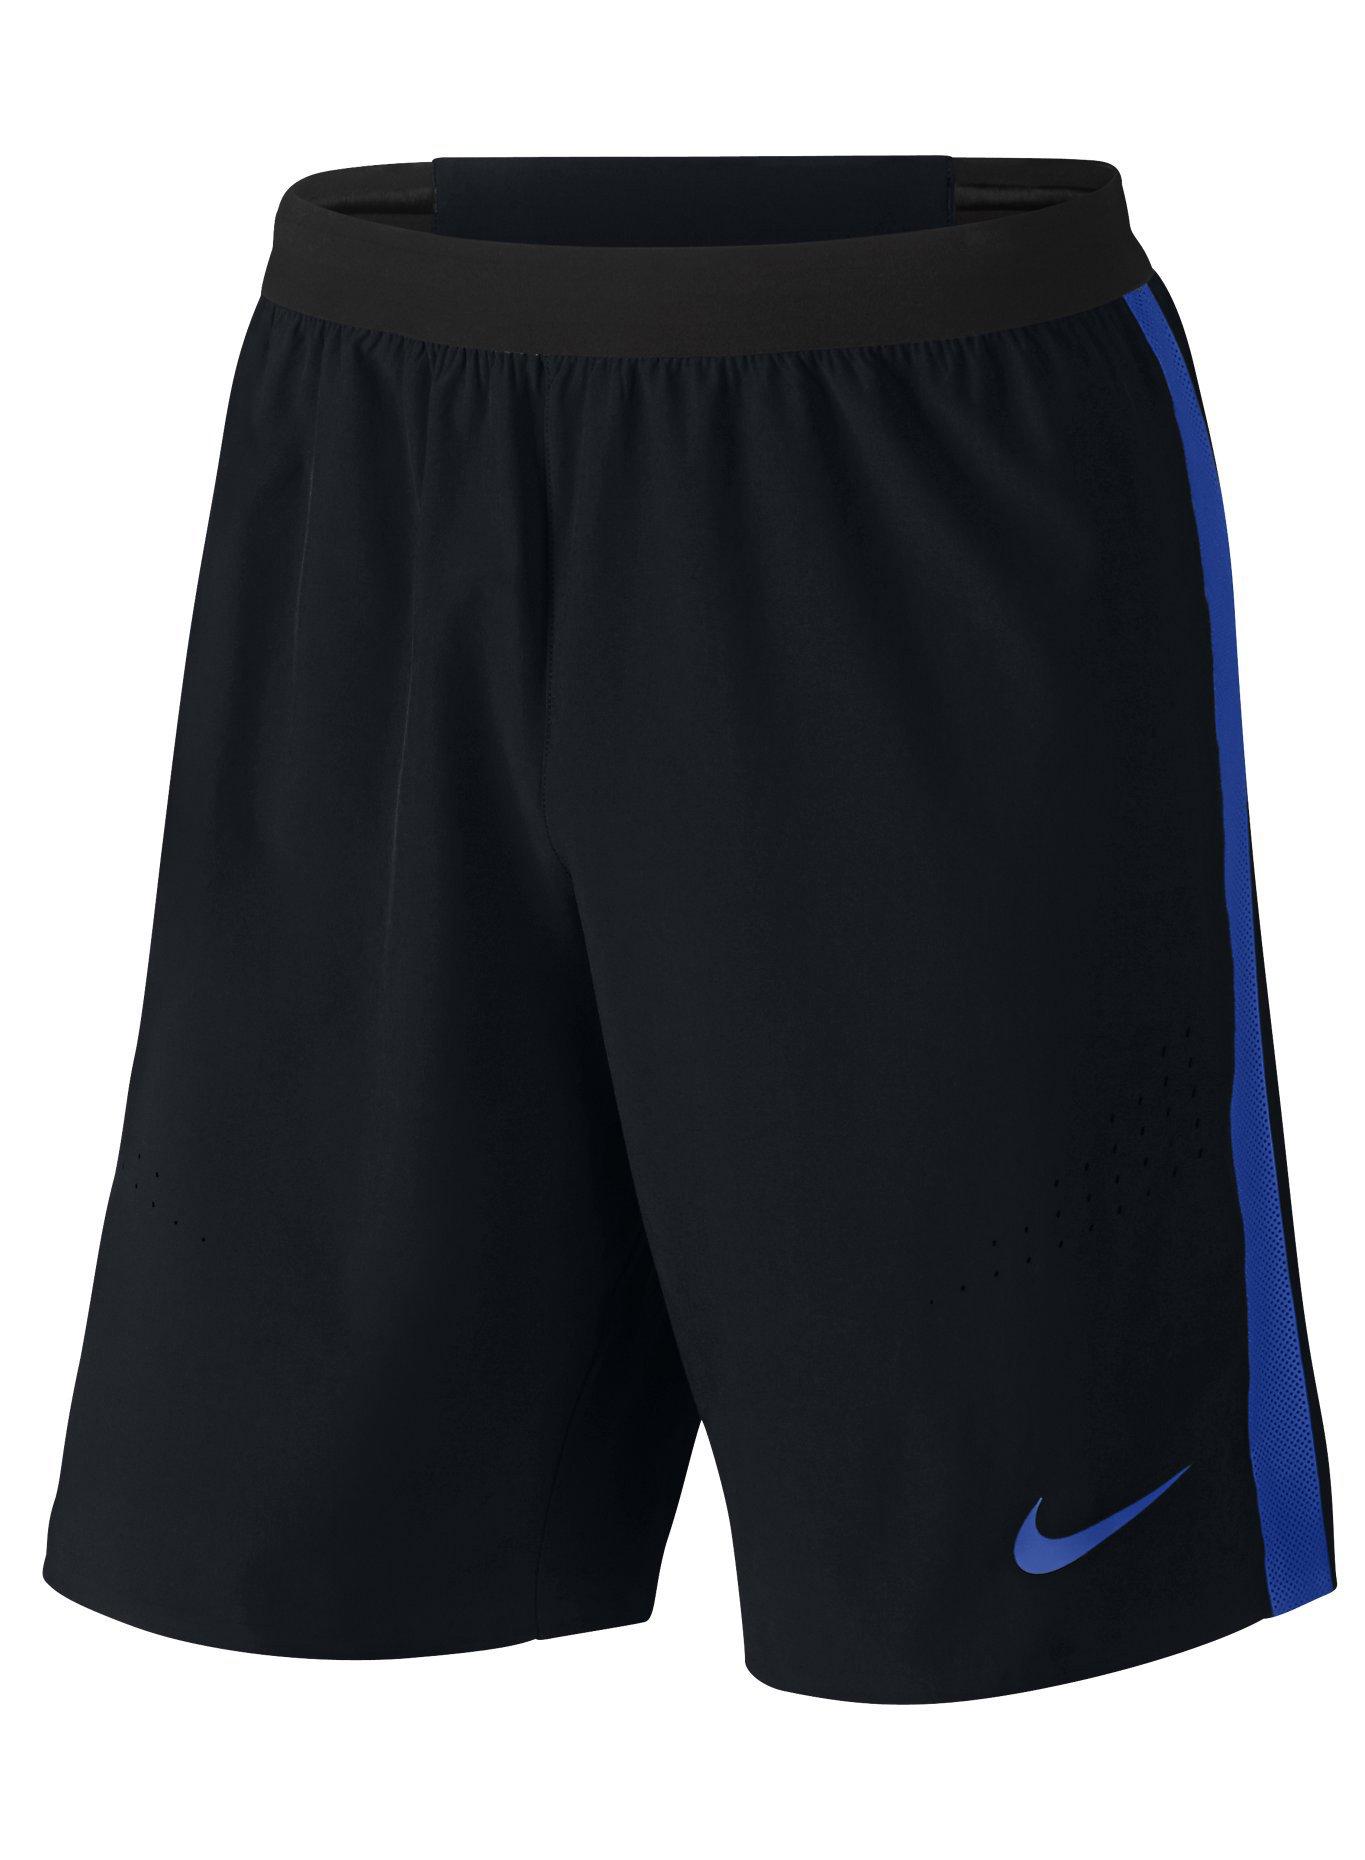 Trenýrky Nike Strike Stretch Longer